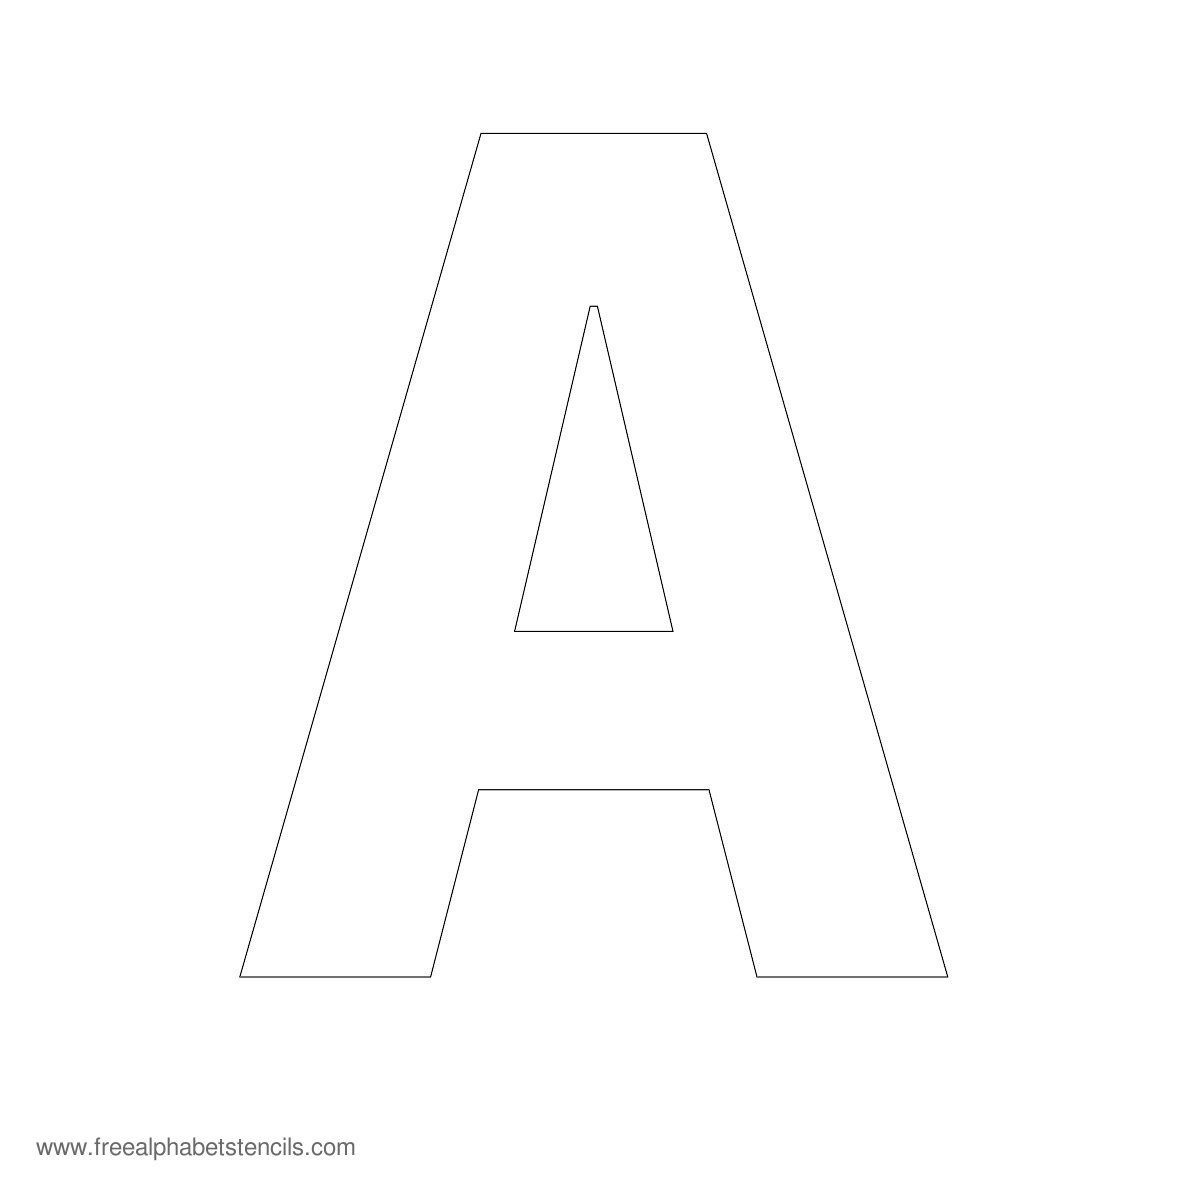 Free Printable Fancy Letters | Free Printable Large Alphabet Letter - Free Printable Extra Large Letter Stencils